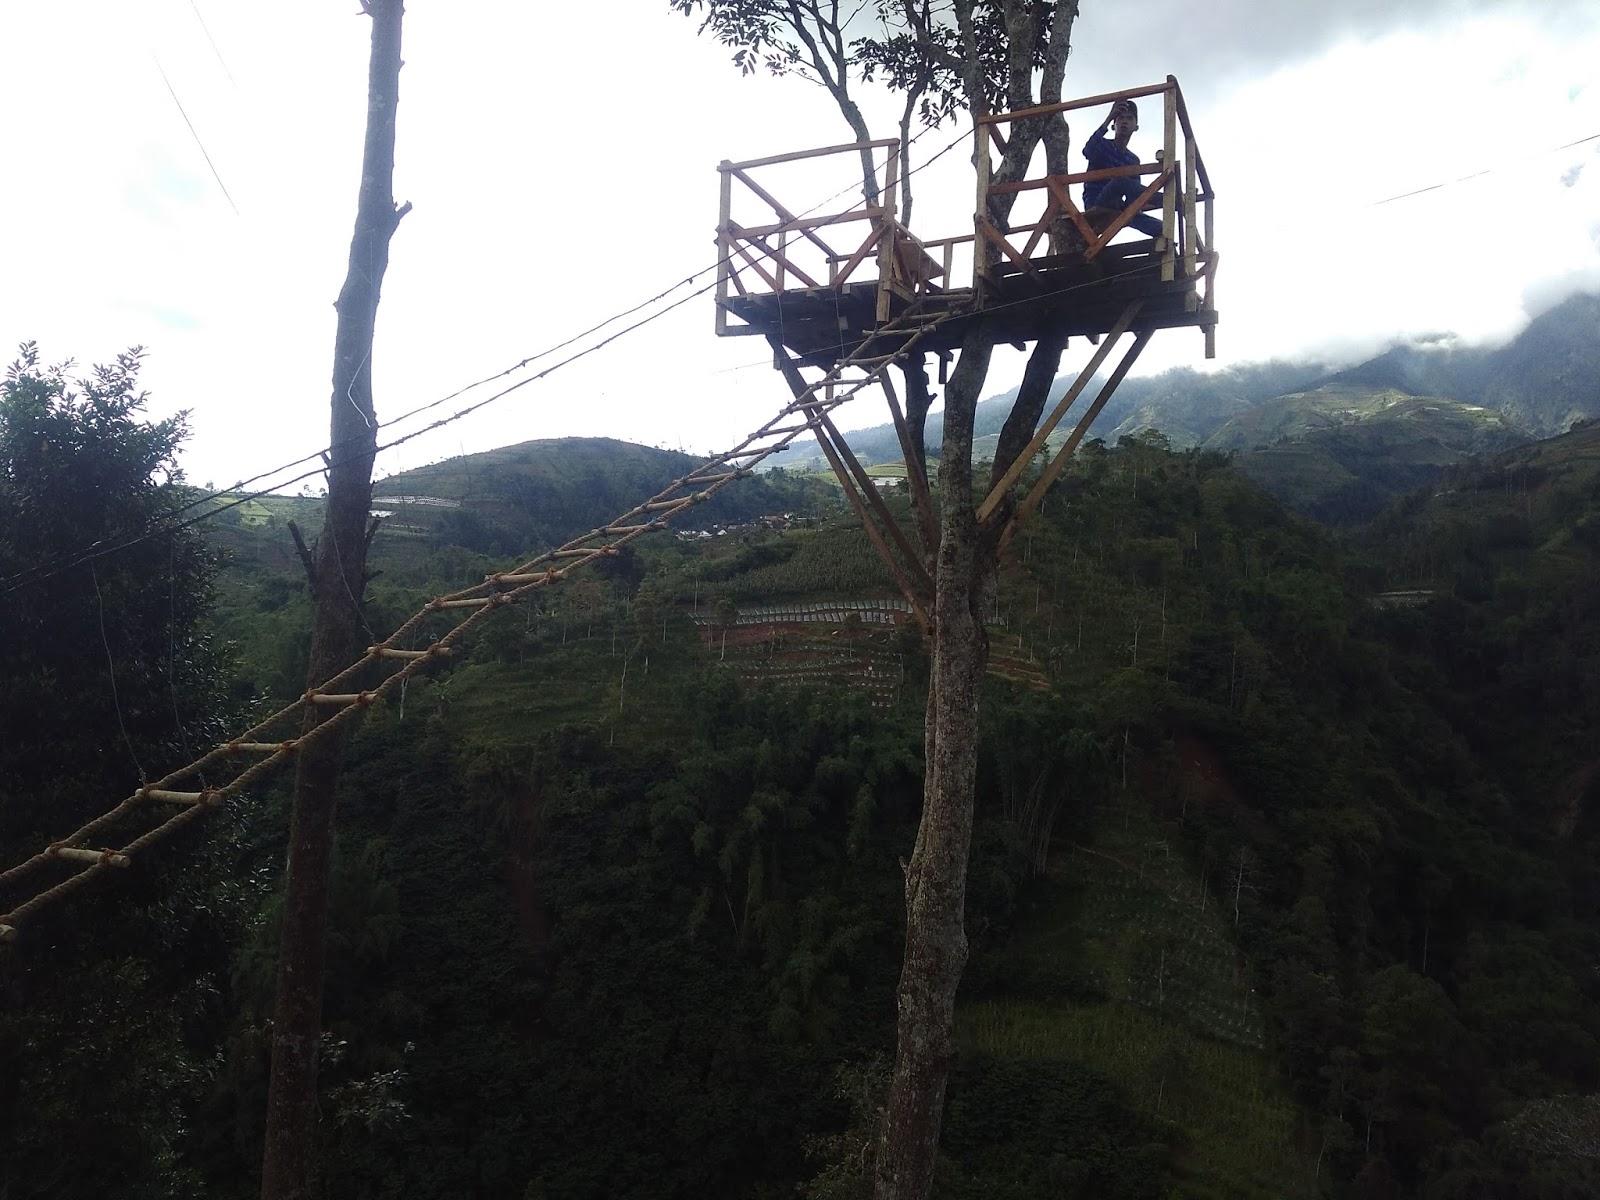 Delimas Obyek Wisata Mempesona Info Borobudur Gardu Pandang Mangli Kab